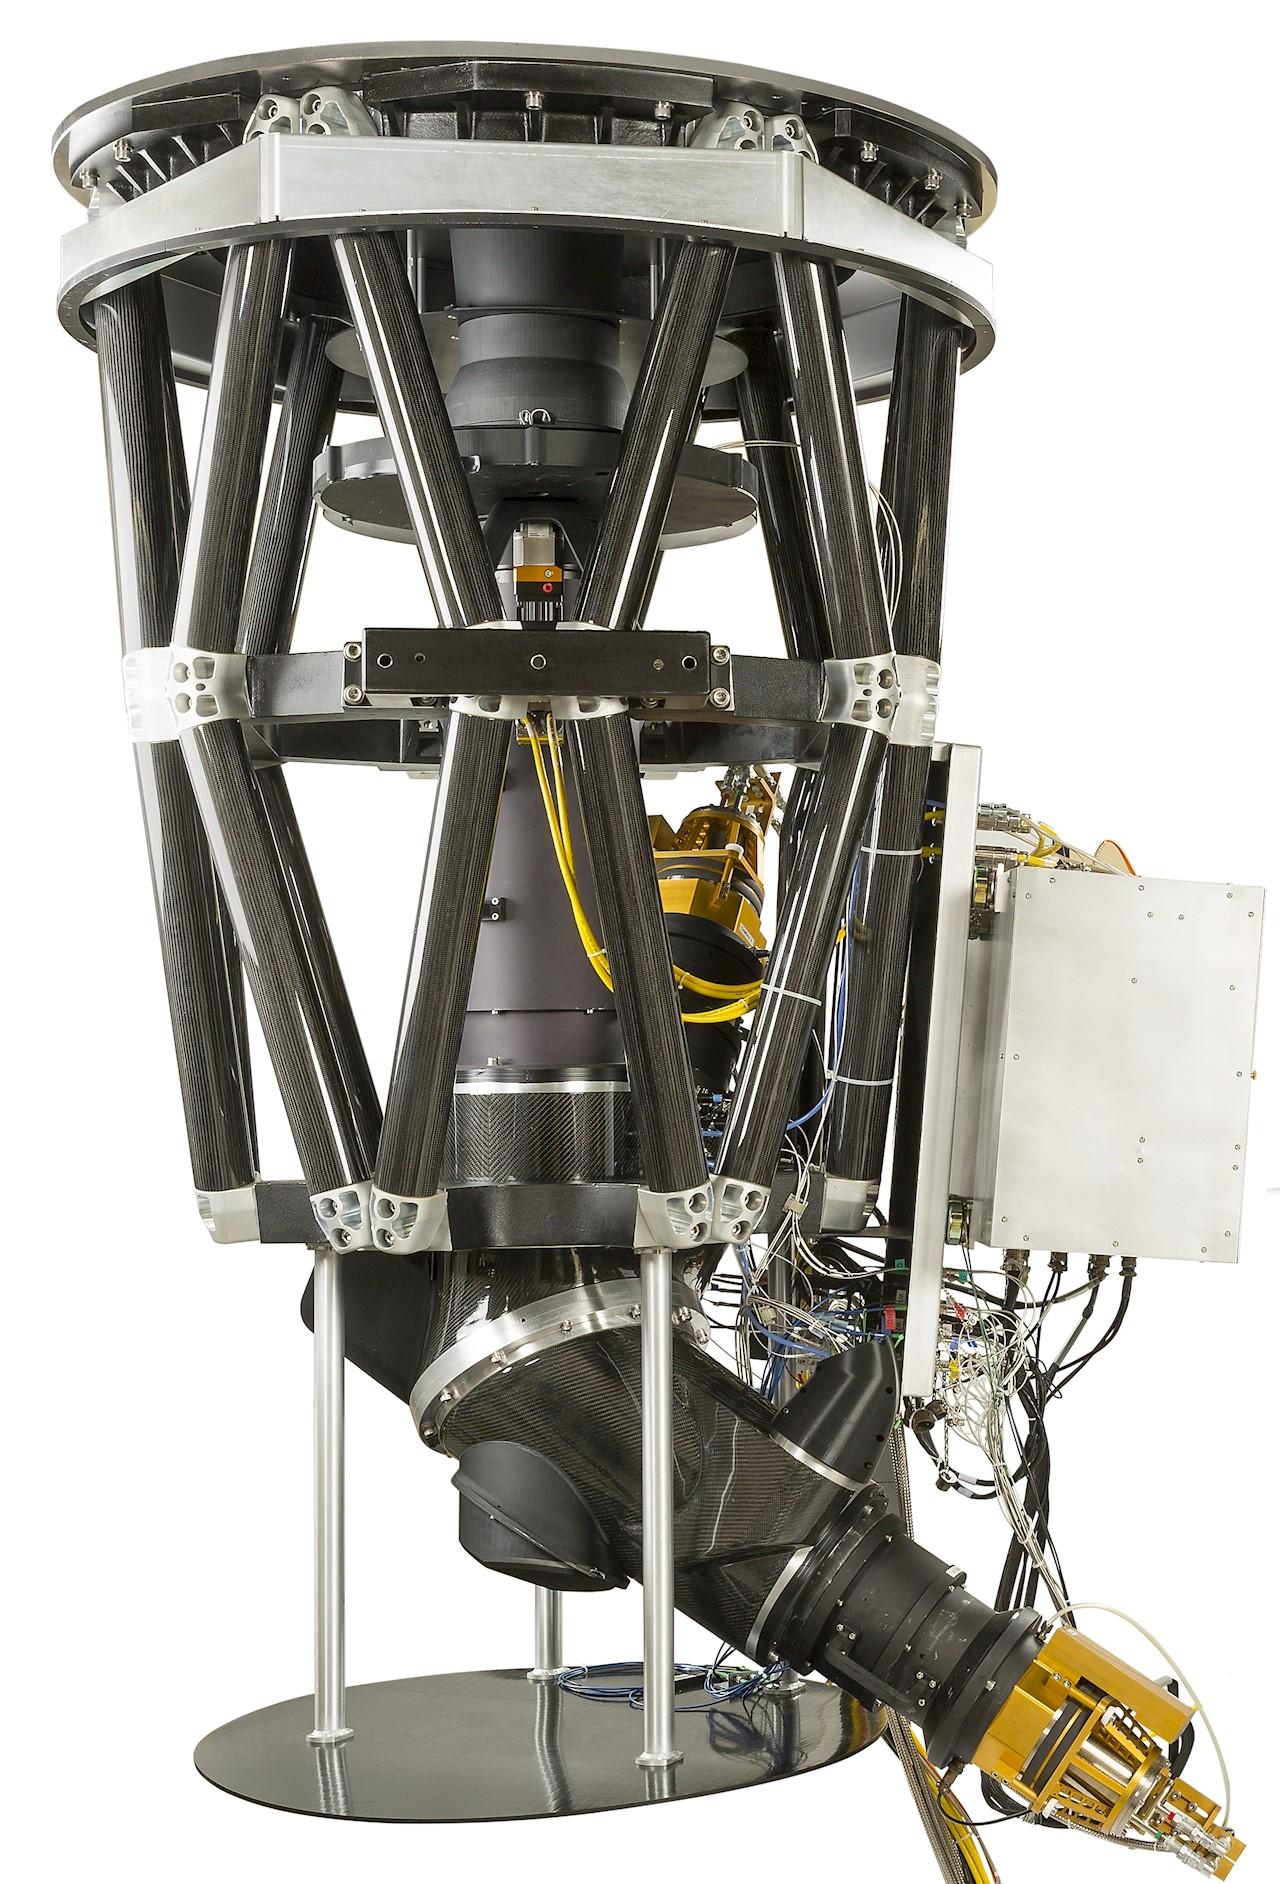 SITELLE instrument Photo credit: ABB